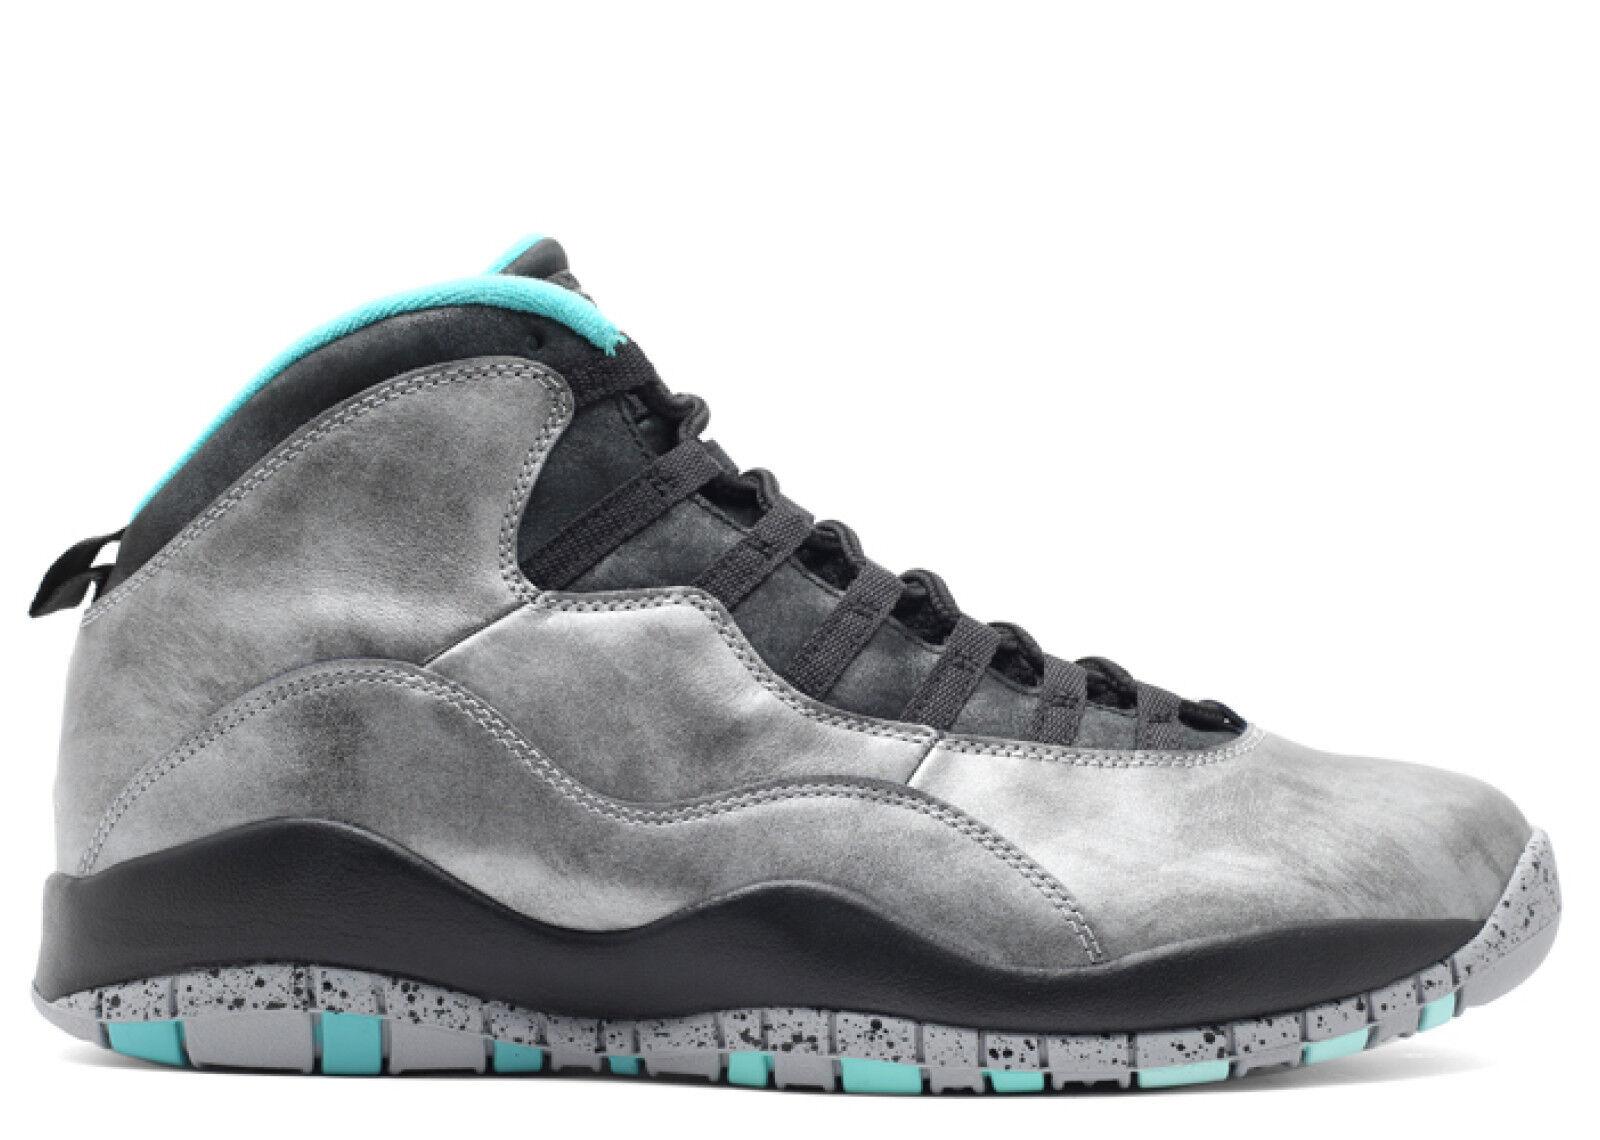 3f79bd413dcbaa ... black venom green cool grey 7c264 ad21a  ireland mens air jordan retro  10 lady liberty athletic fashion sneakers 705178 045 39e57 b7b95